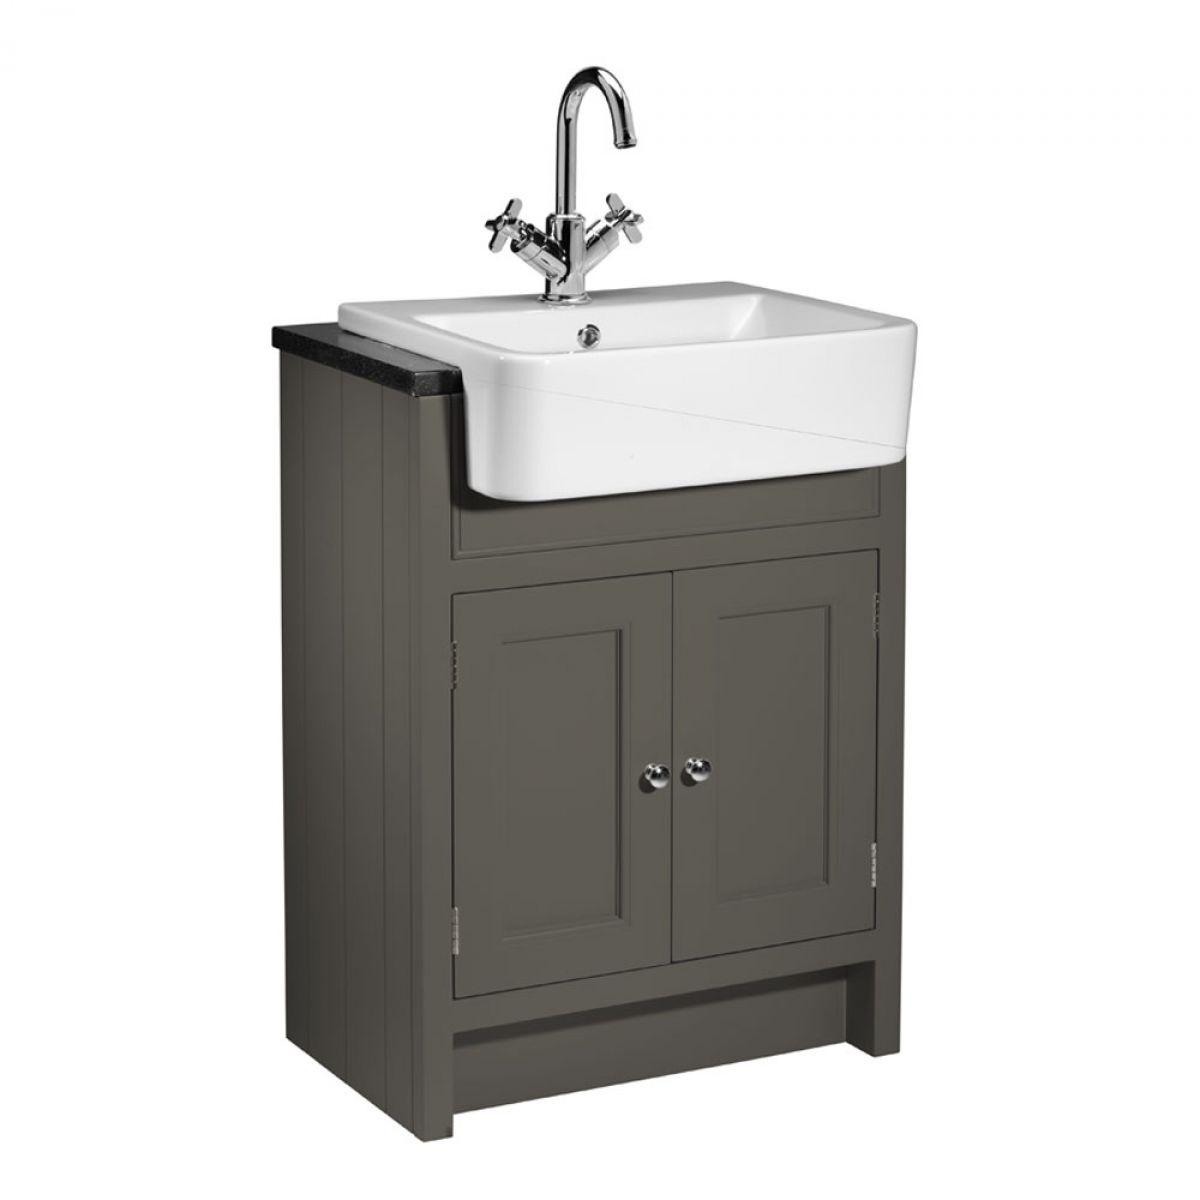 Countertop Unit : ... Rhodes Hampton 600mm Semi-Countertop Unit and Geo Basin : UK Bathrooms